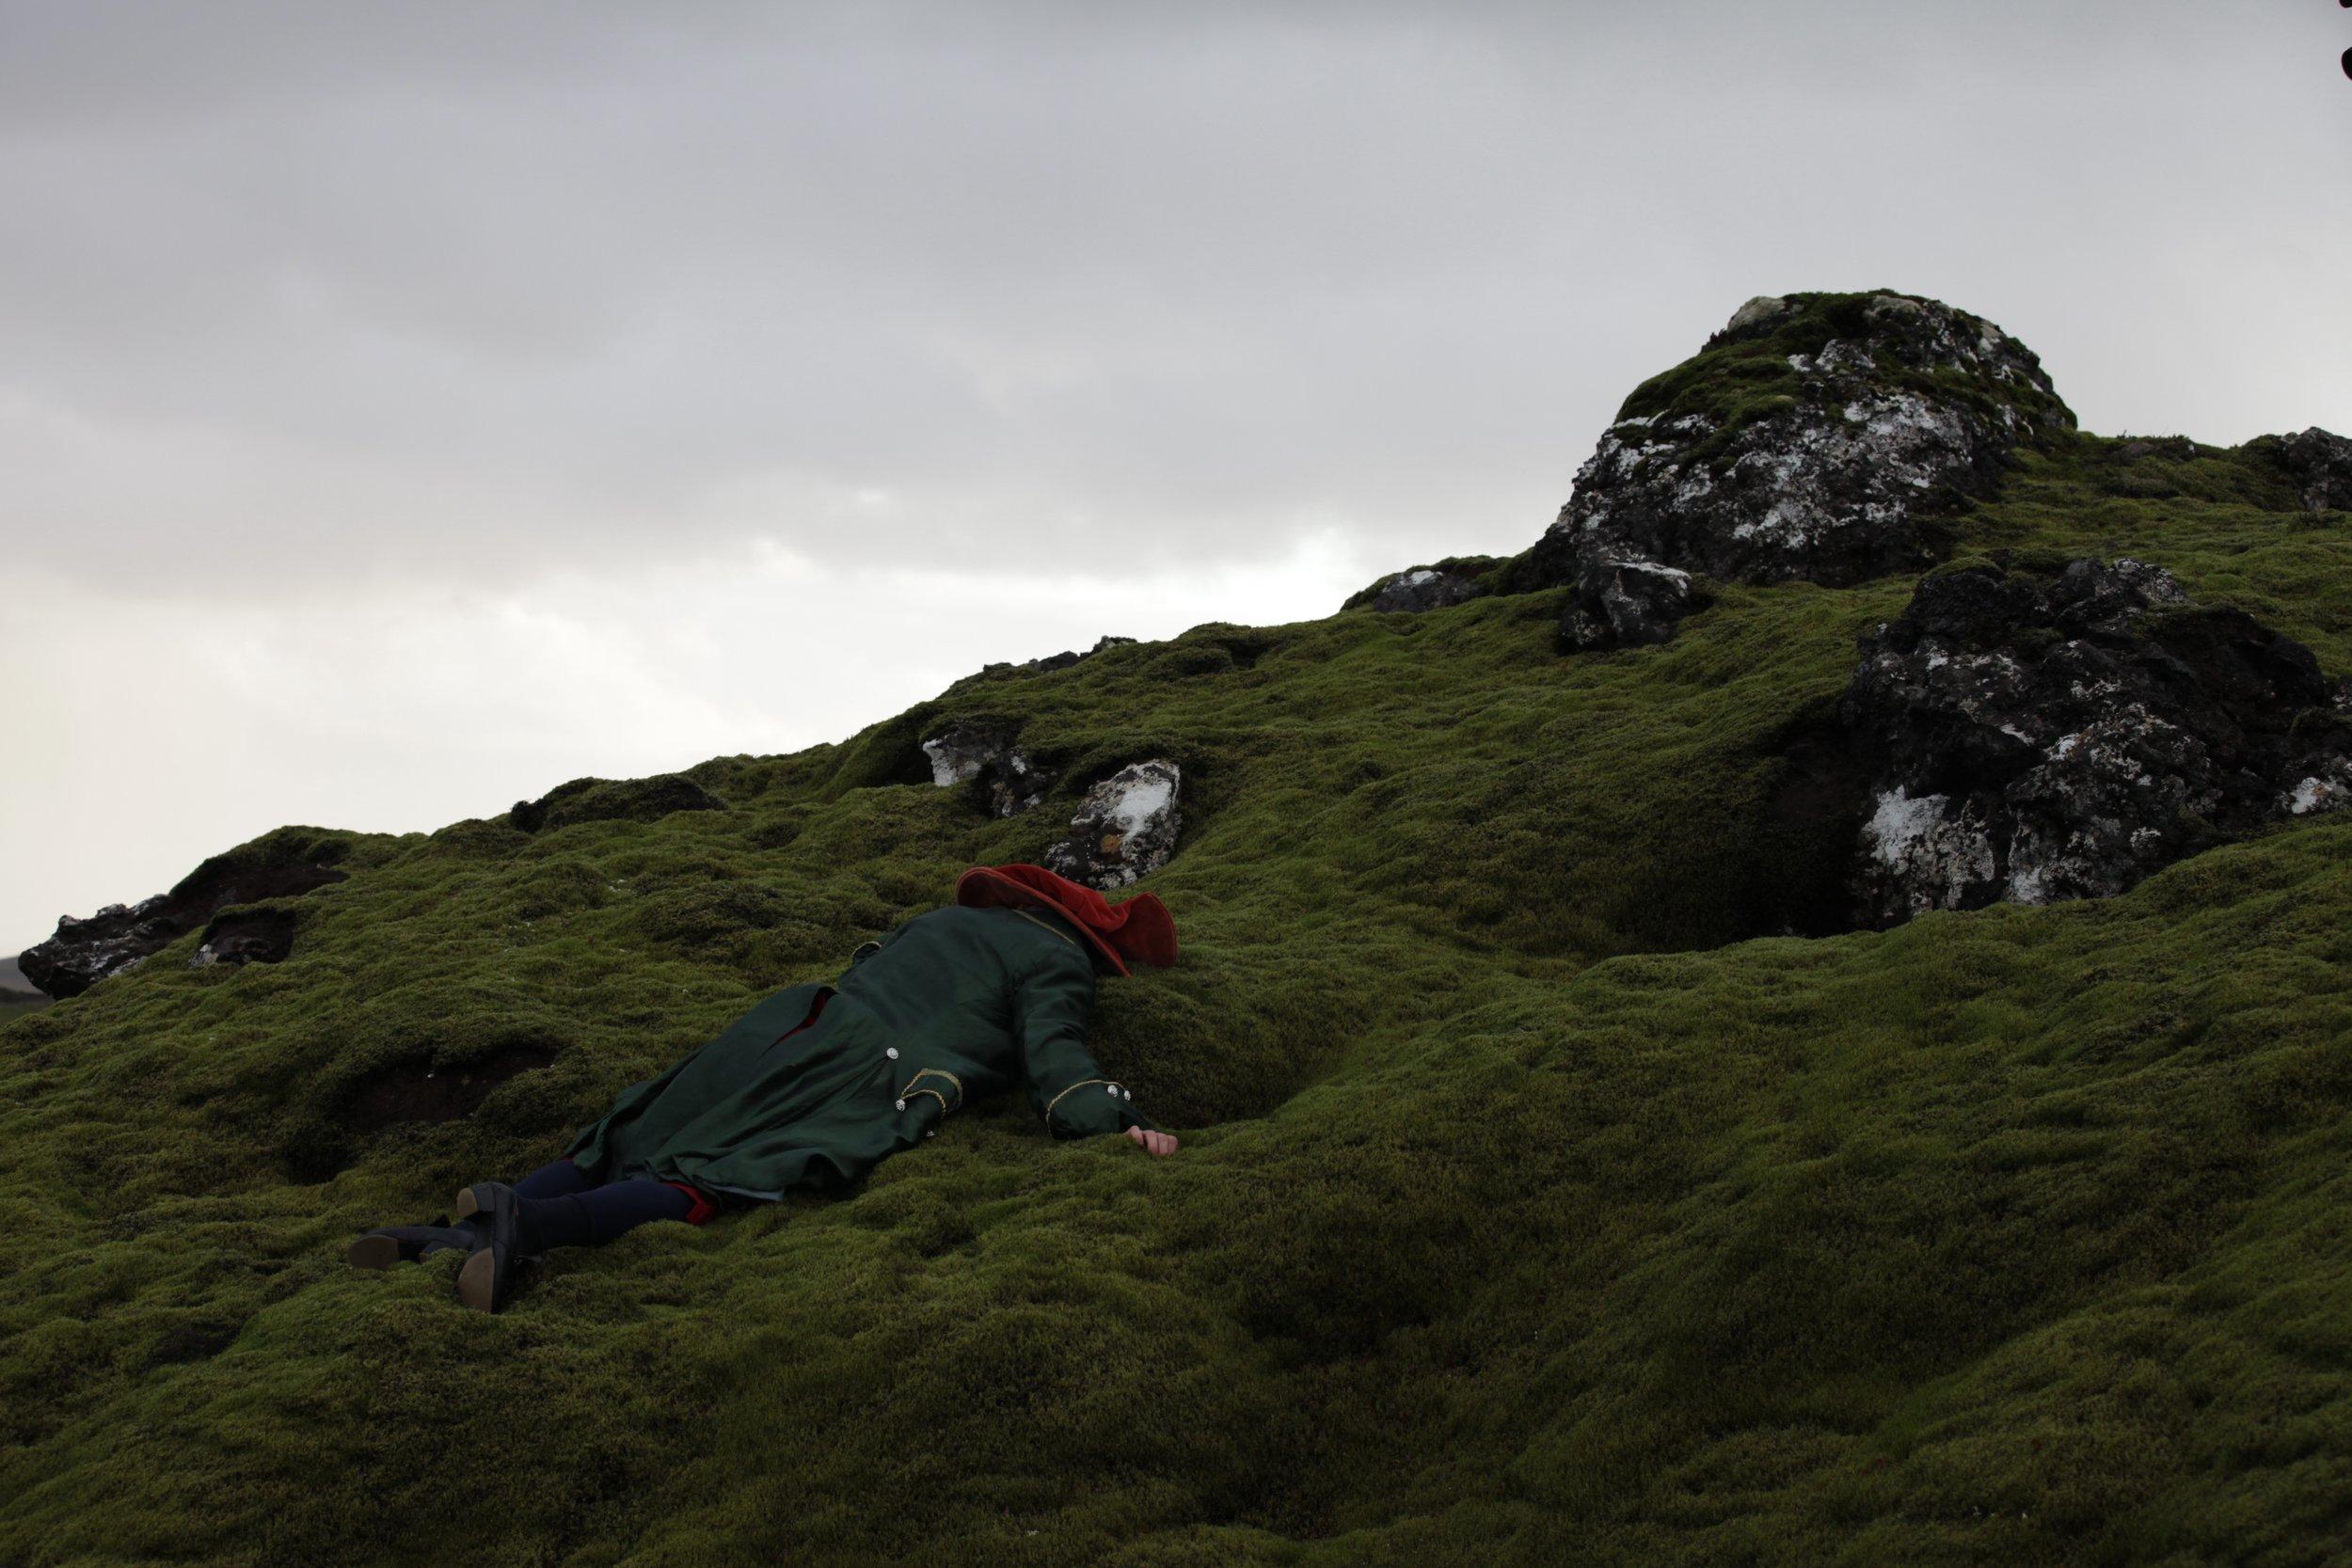 02 HnM - Performance Kilián Ignác D. Iceland 2016.jpg